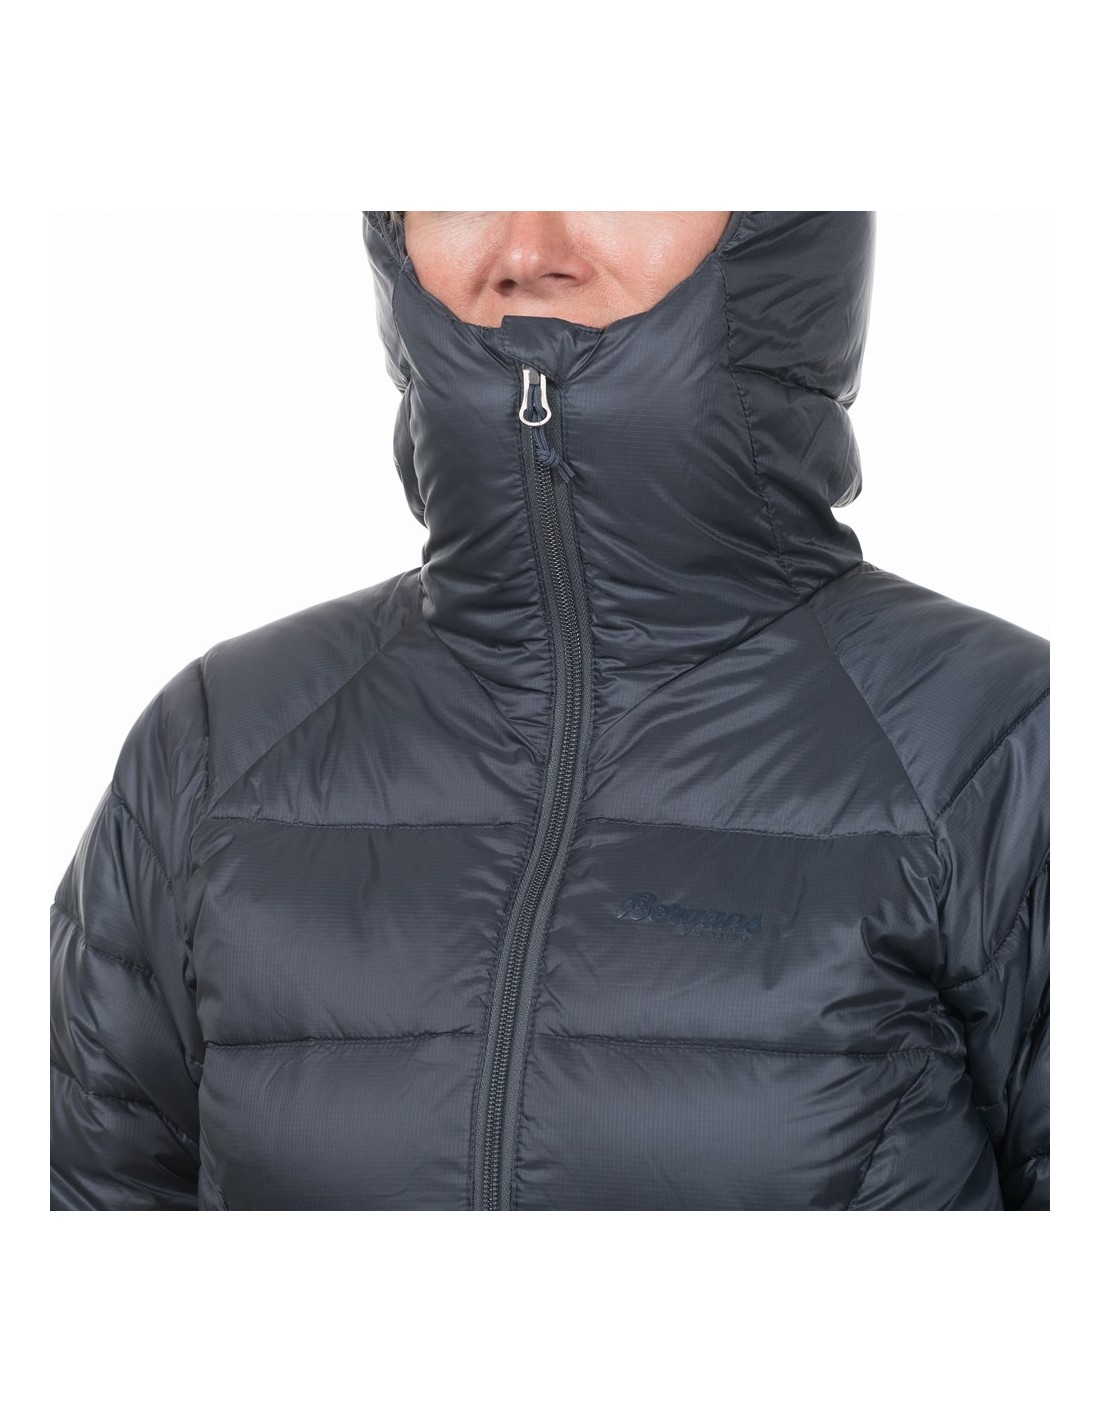 51823a32 ... Ski og Snowboardjakker Damer Bergans Slingsby Down Light Dame Jacket  w/Hood 8723 ...